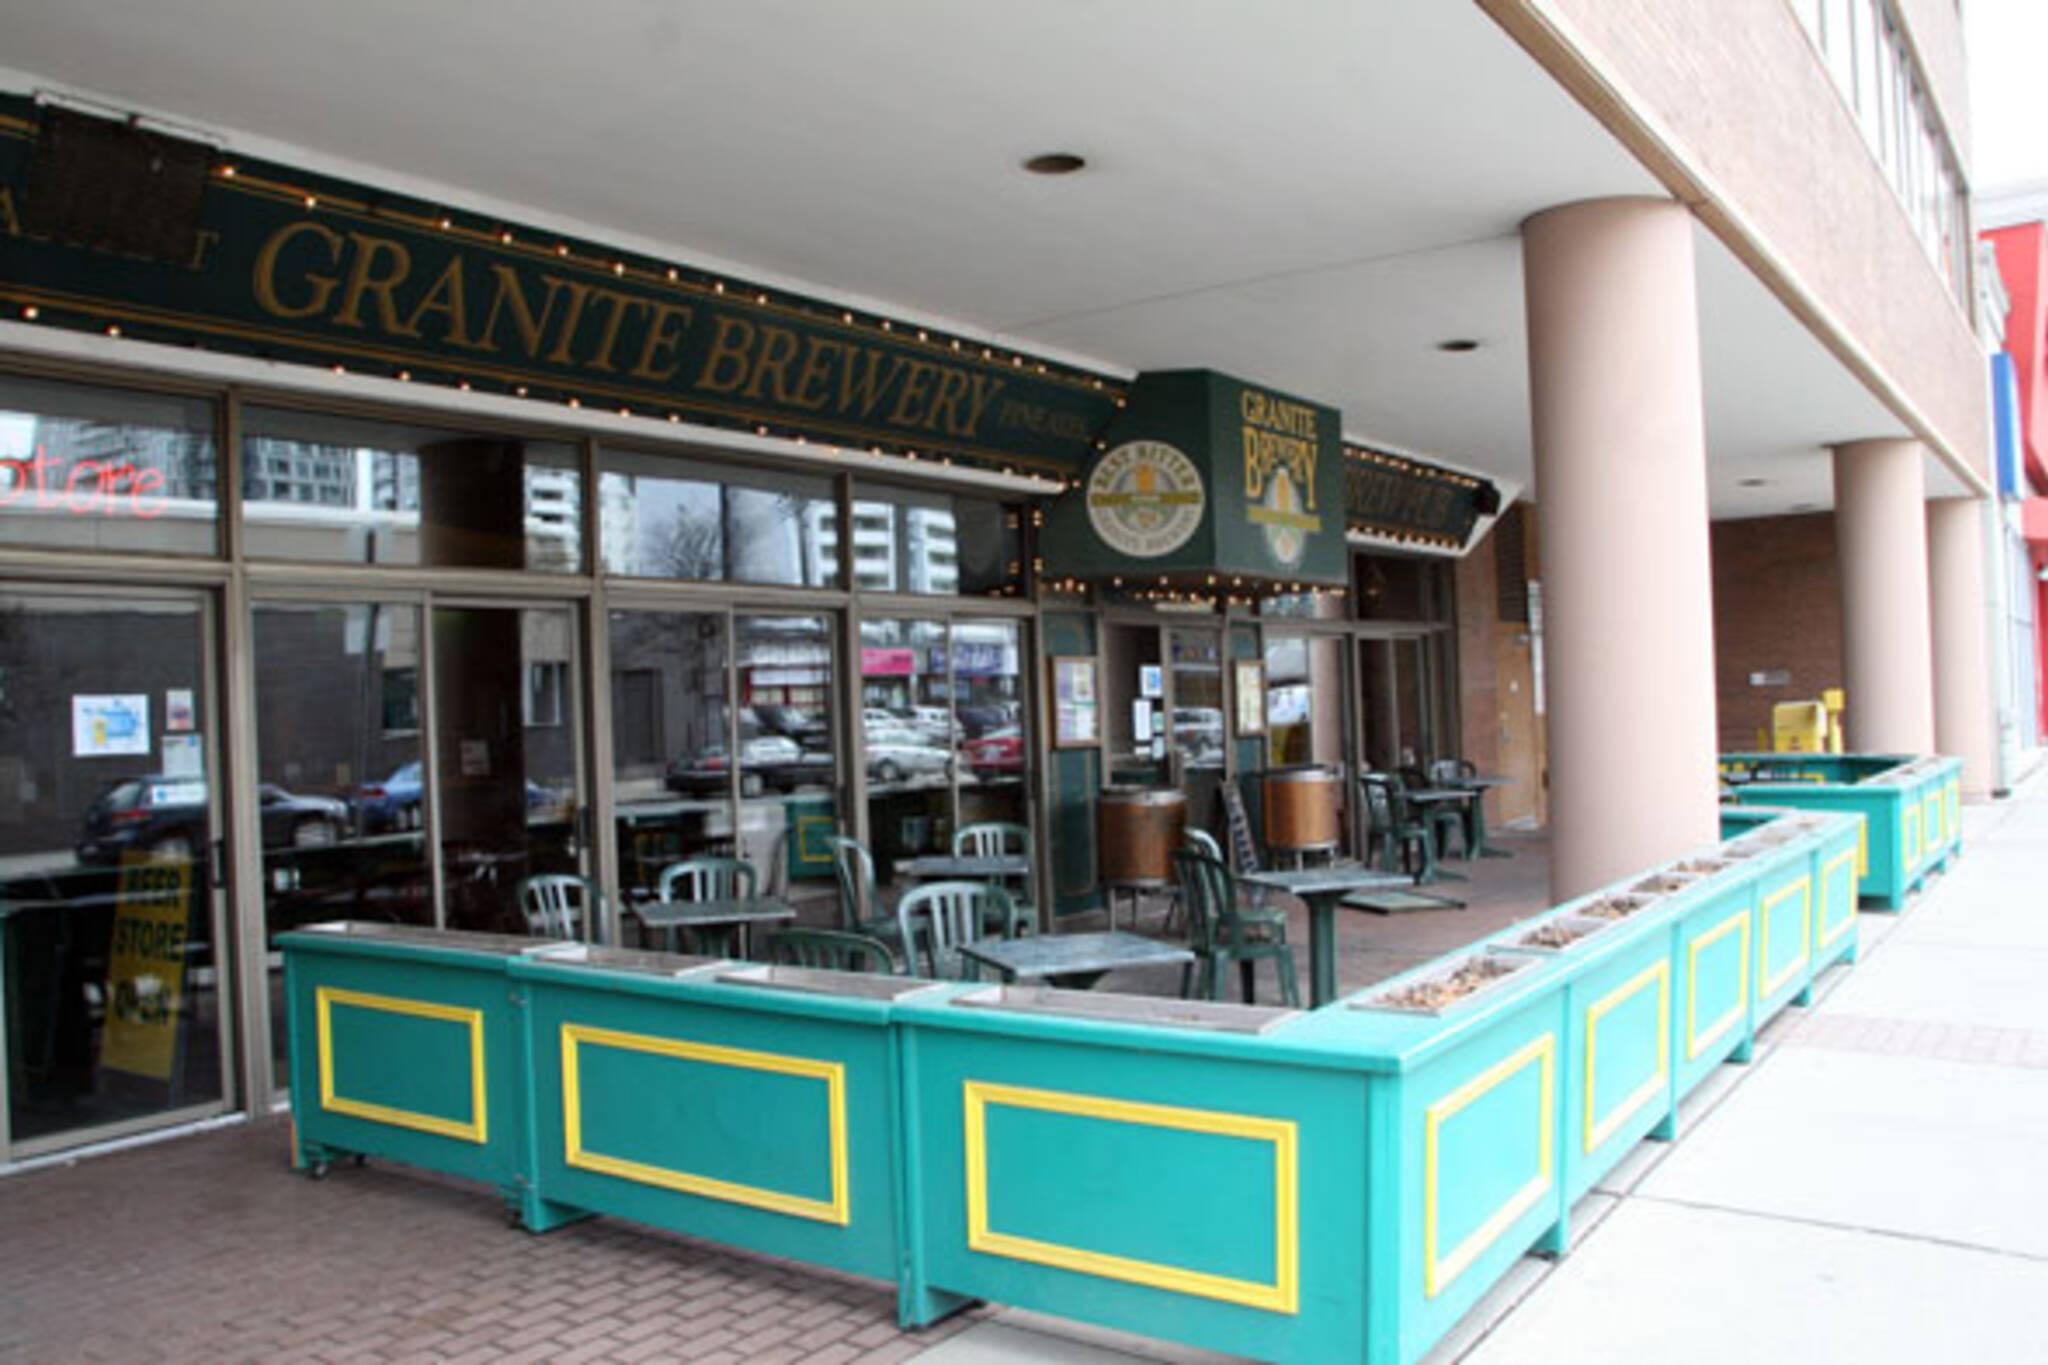 Granite Brewery